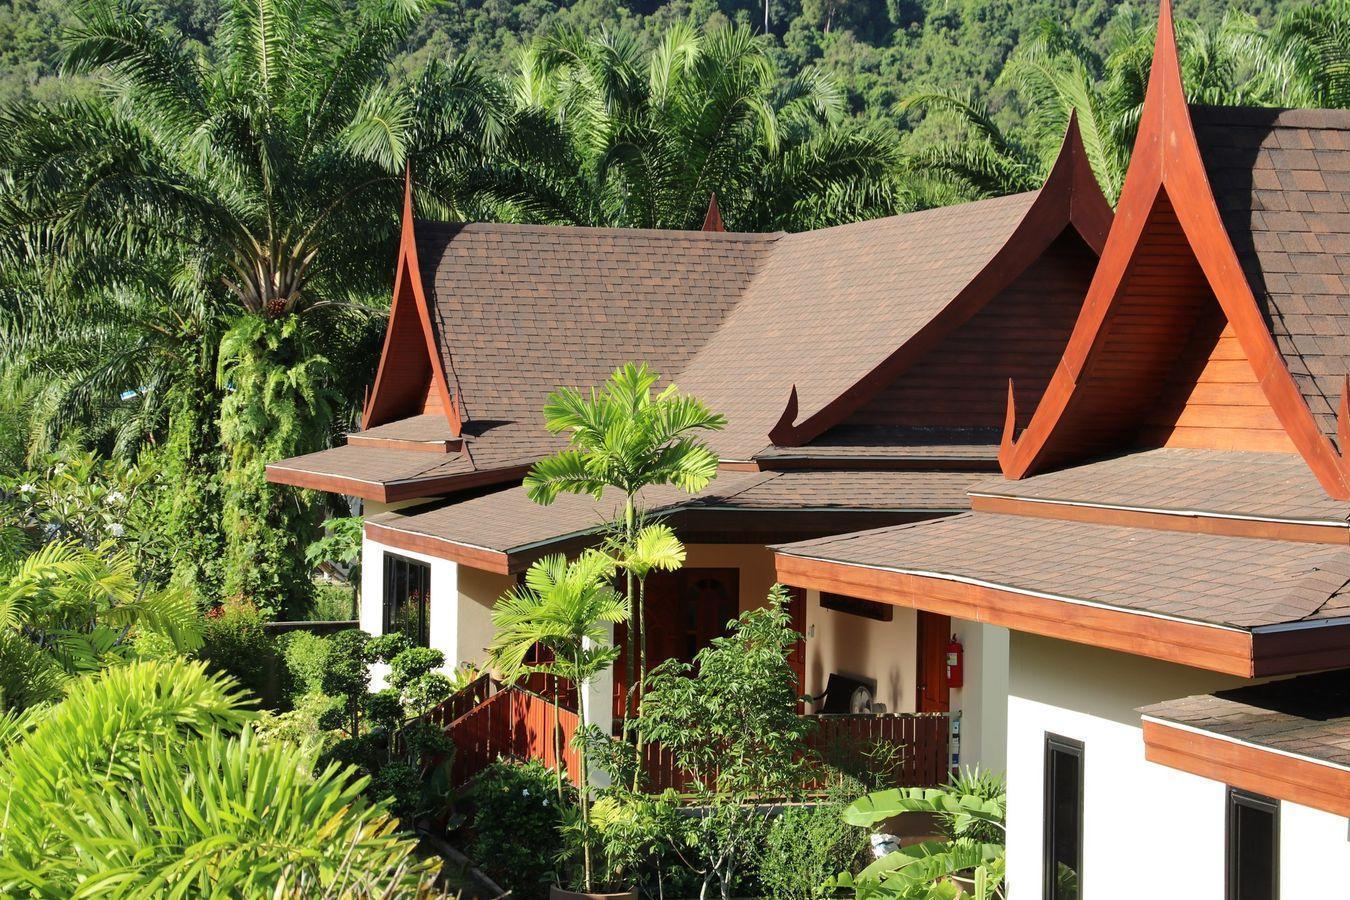 Chanapha Residence Chanapha Residence